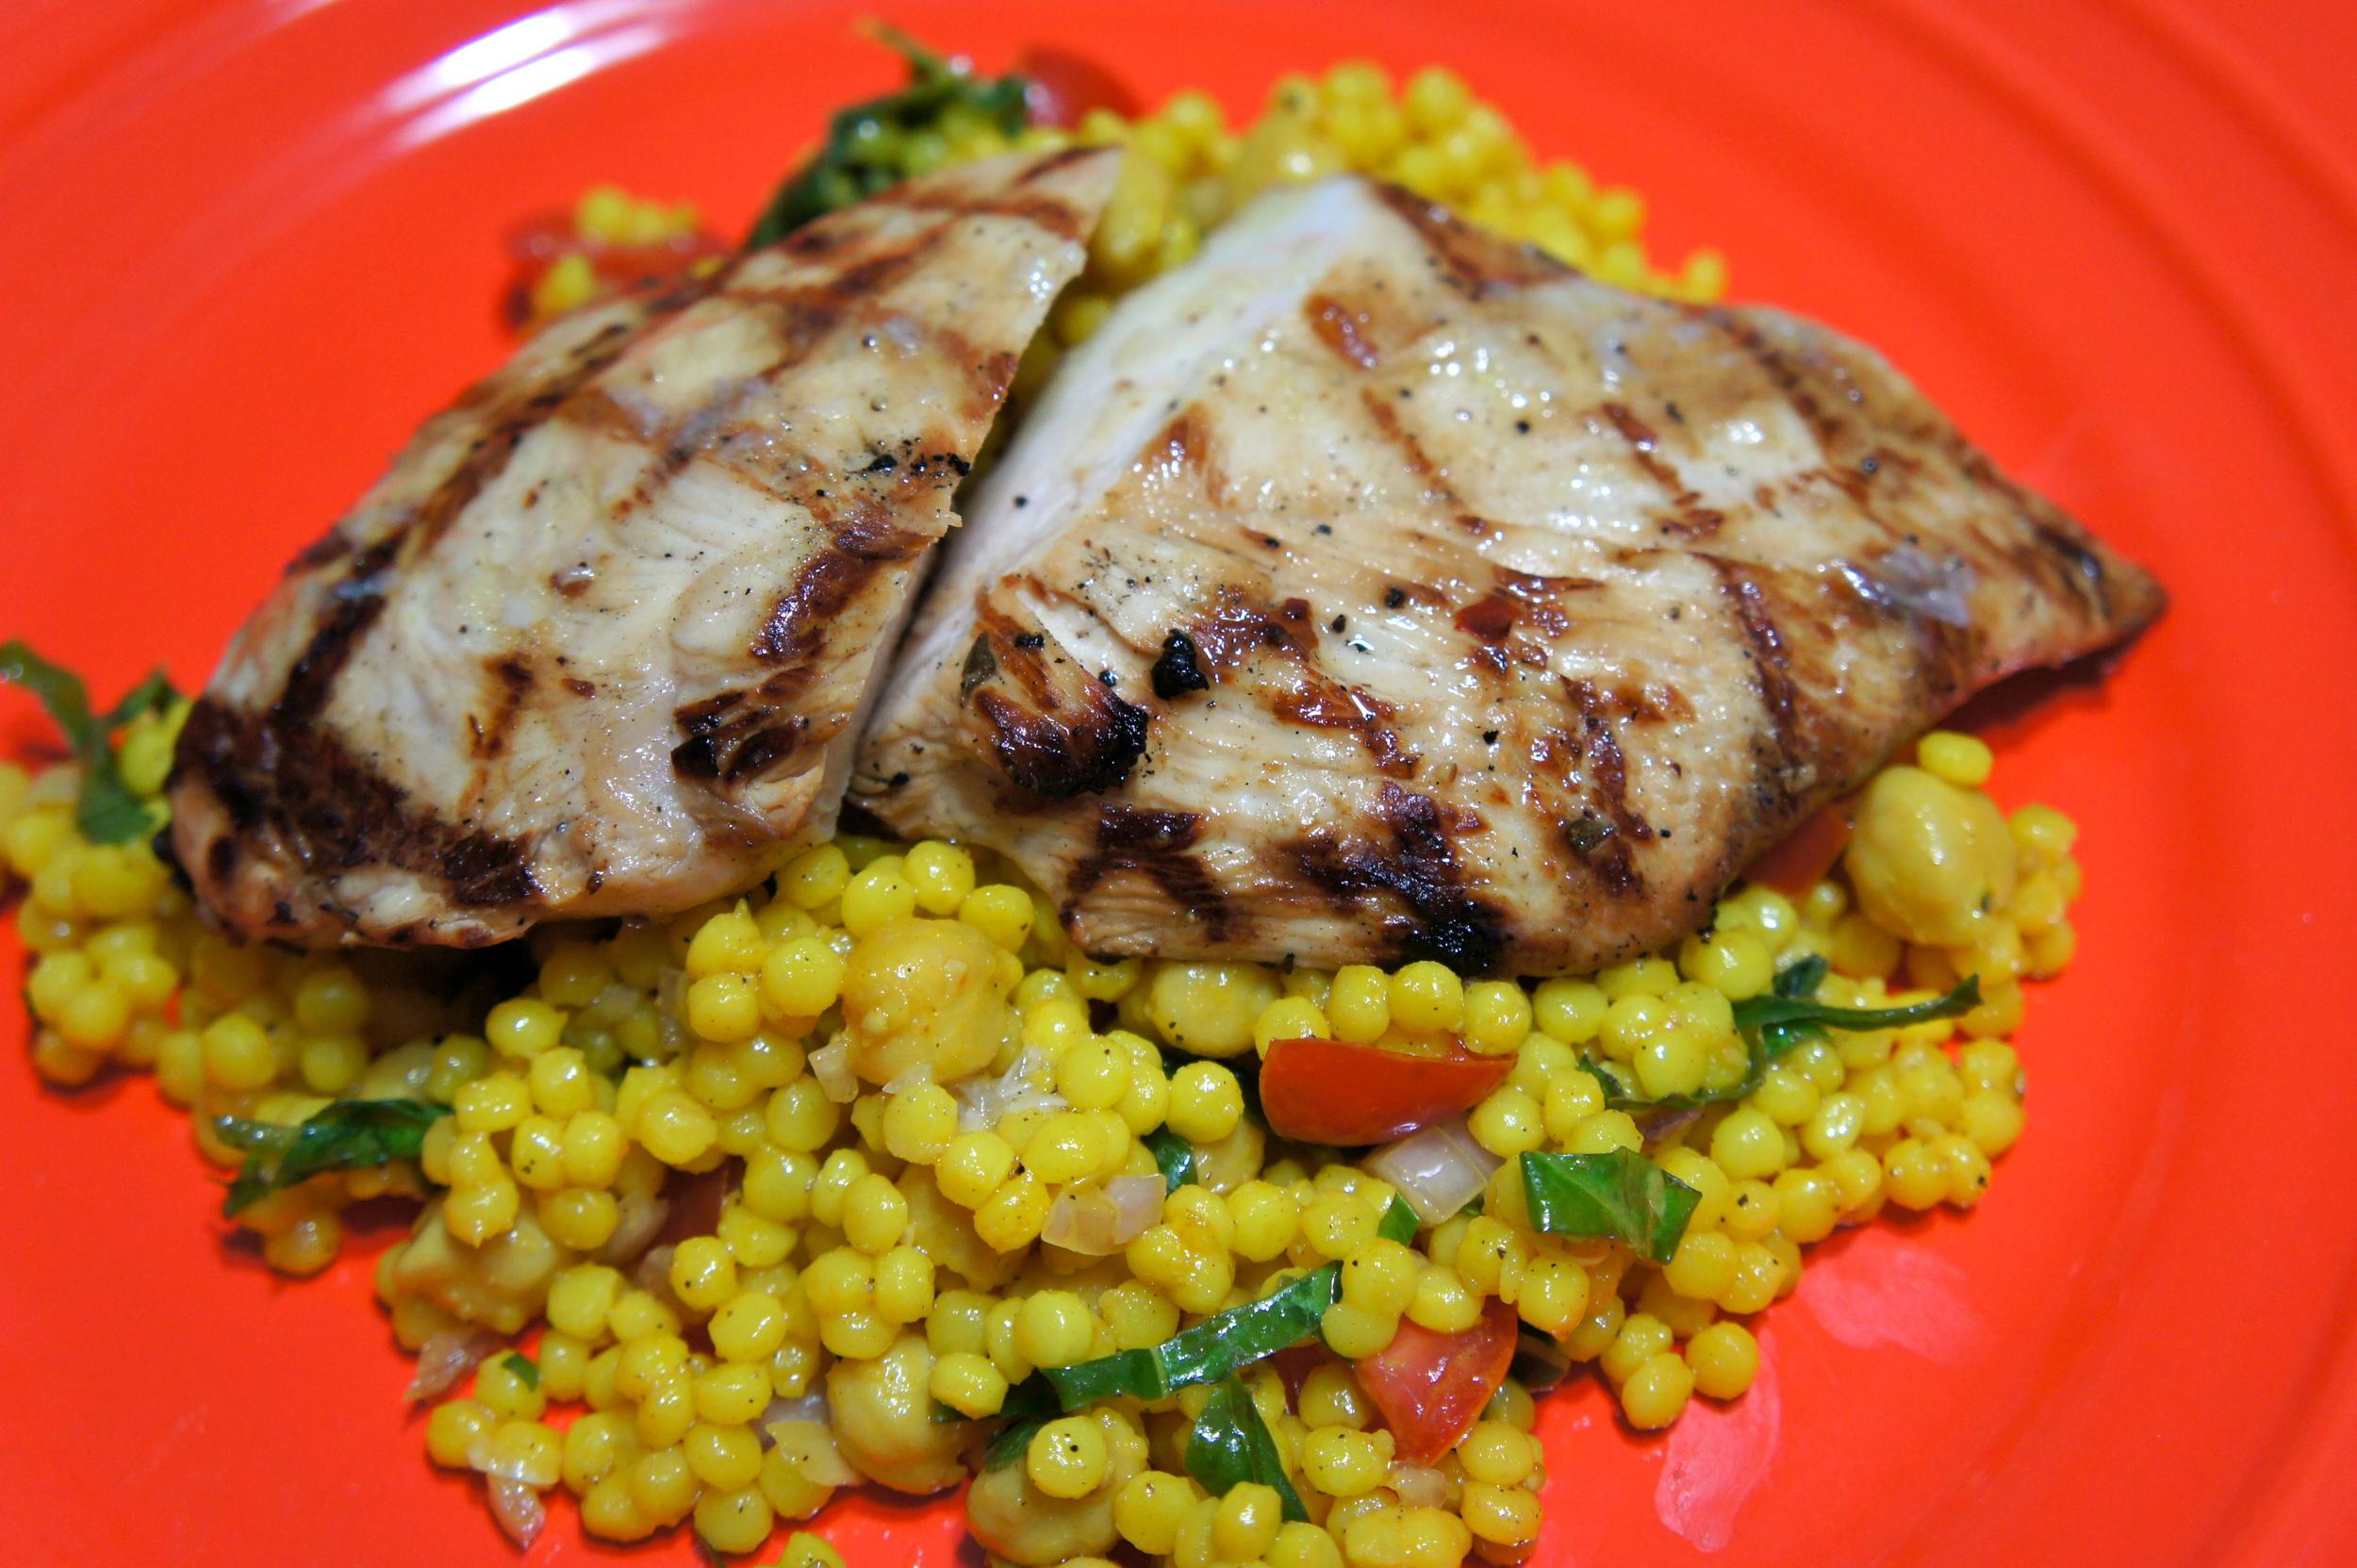 Garlic Lemon Chicken with Couscous Salad